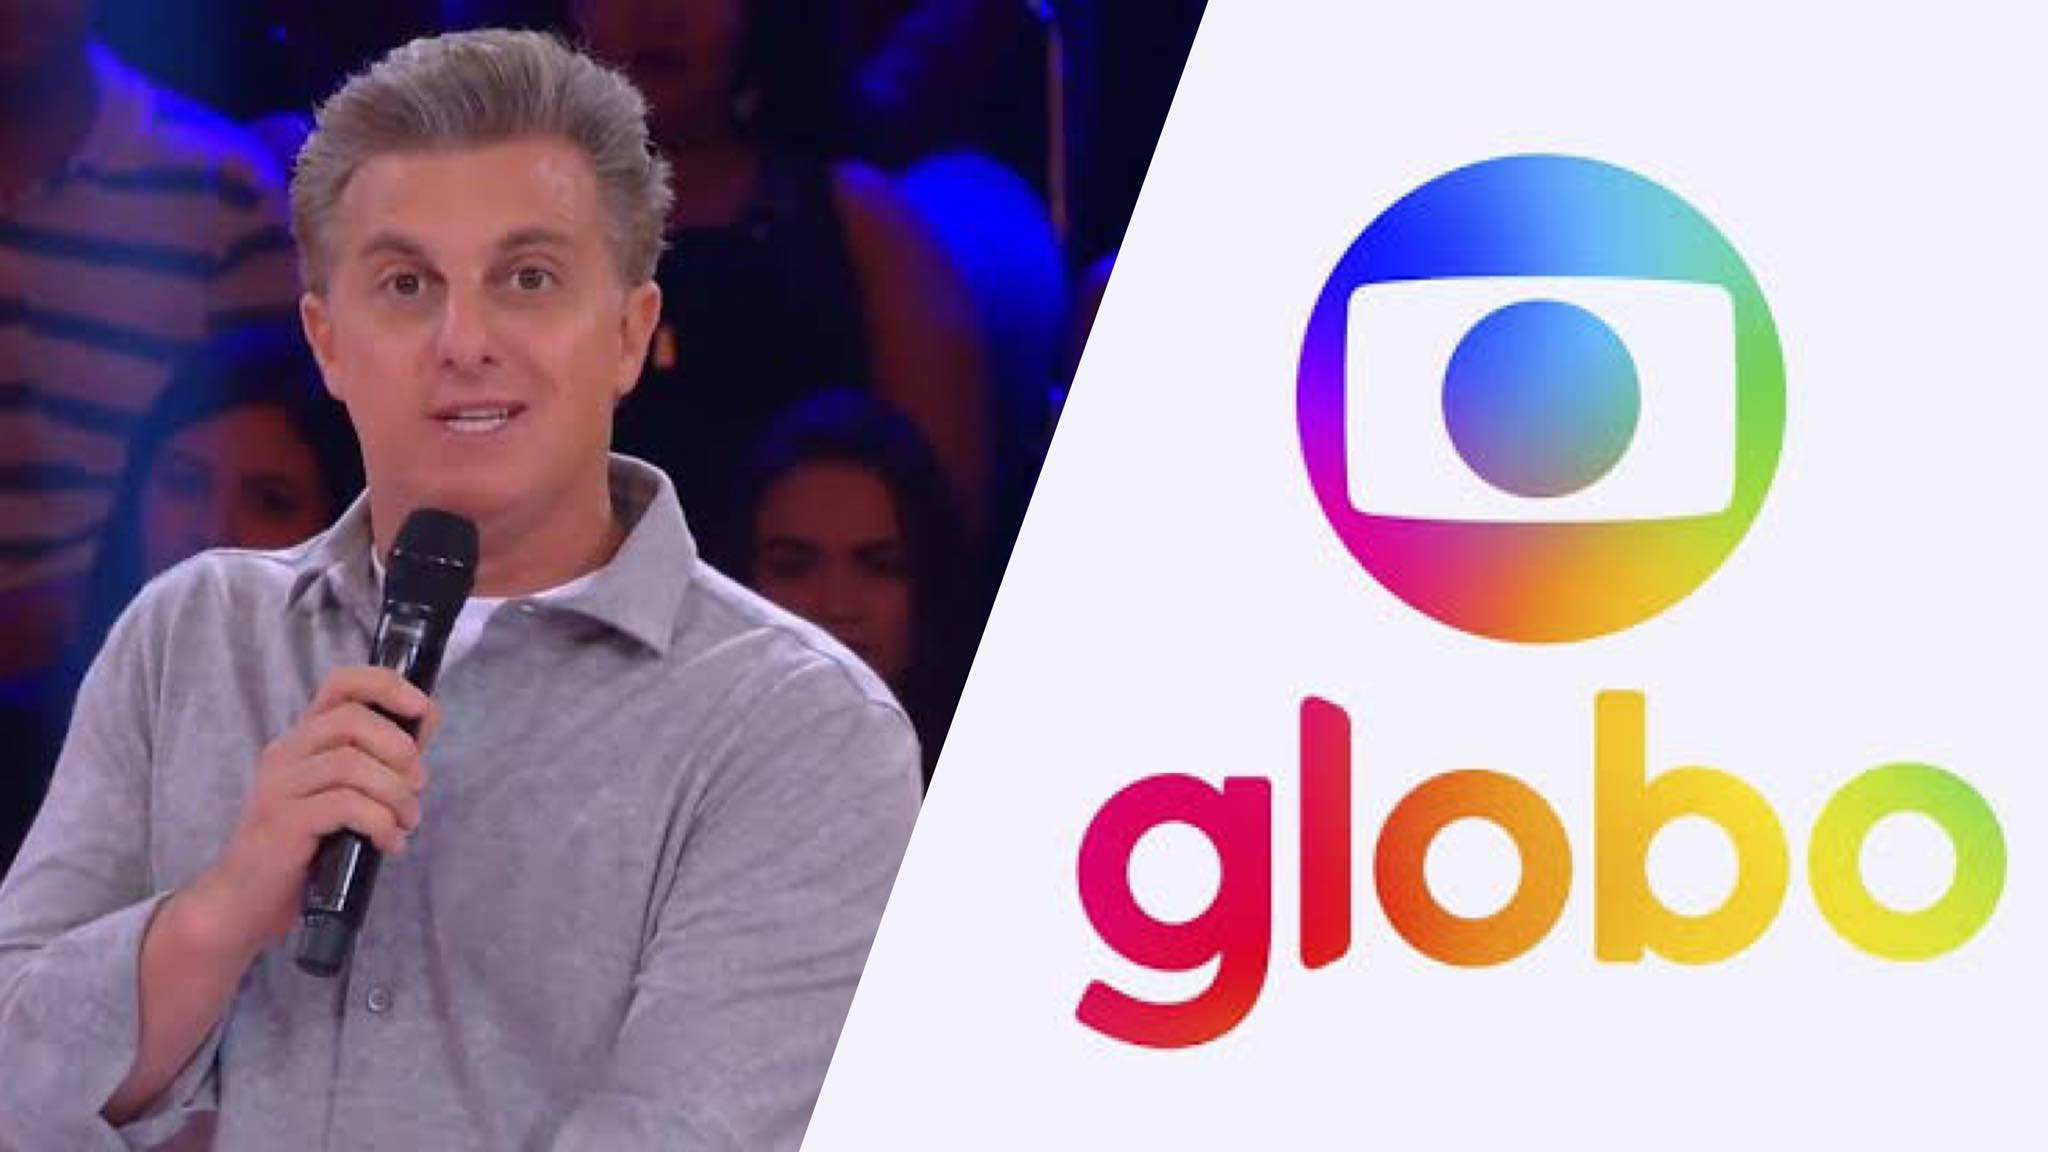 Luciano Huck estreia dia 5 de setembro nos domingos da Globo. Fonte: Montagem/ Fashion Bubbles